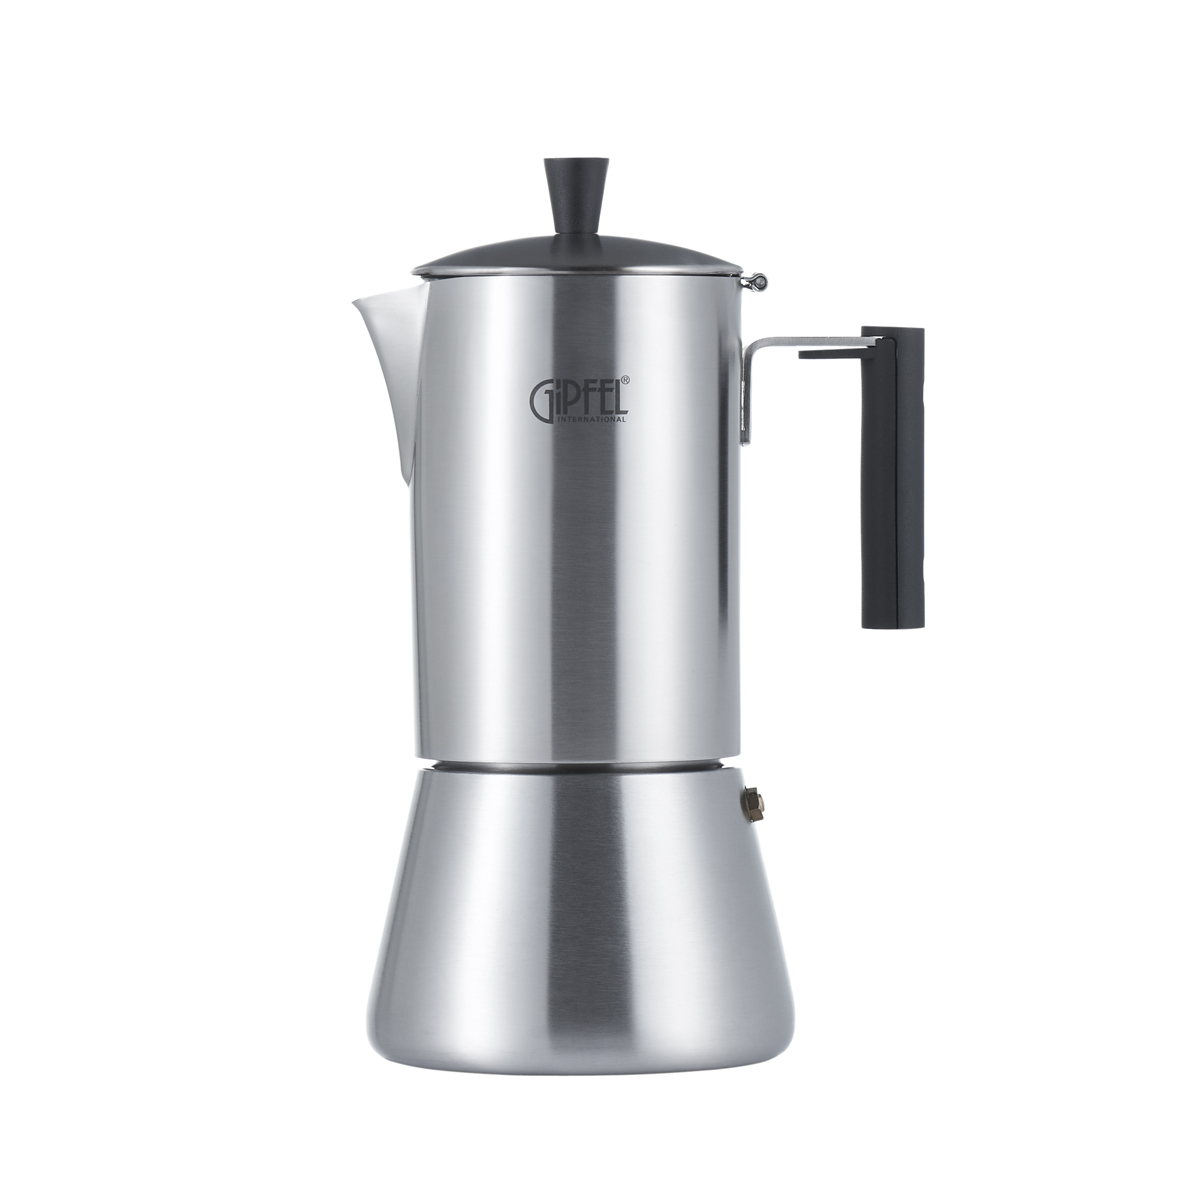 Гейзерная кофеварка Gipfel Azzimato 5394 0,5 л